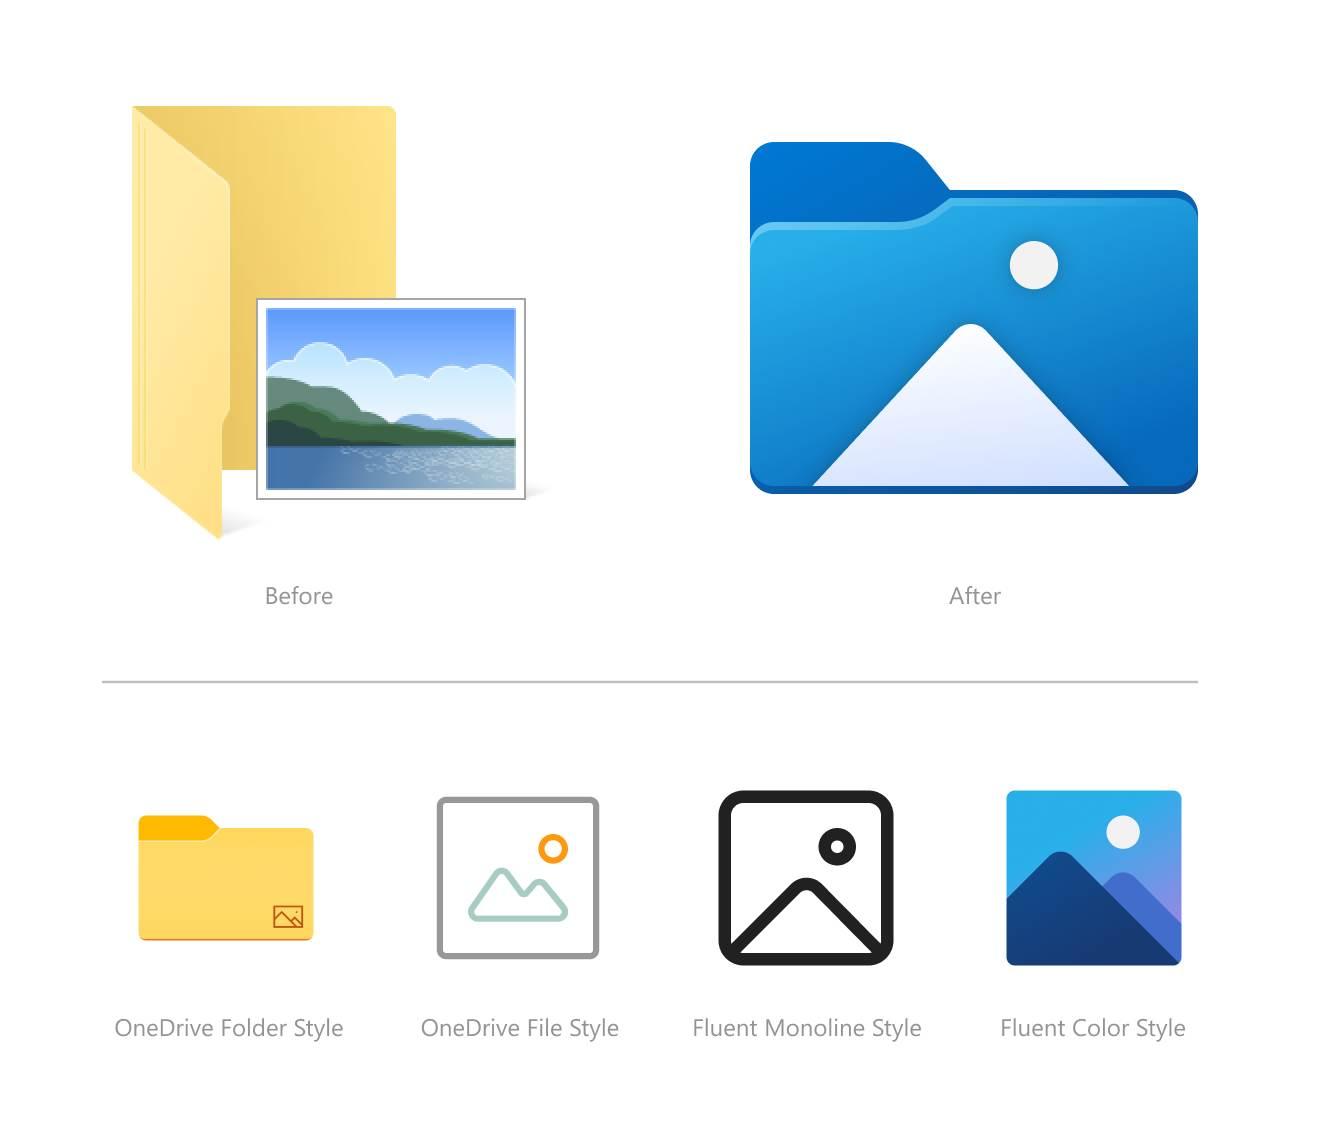 Folder sa slikama ikonice pre i posle